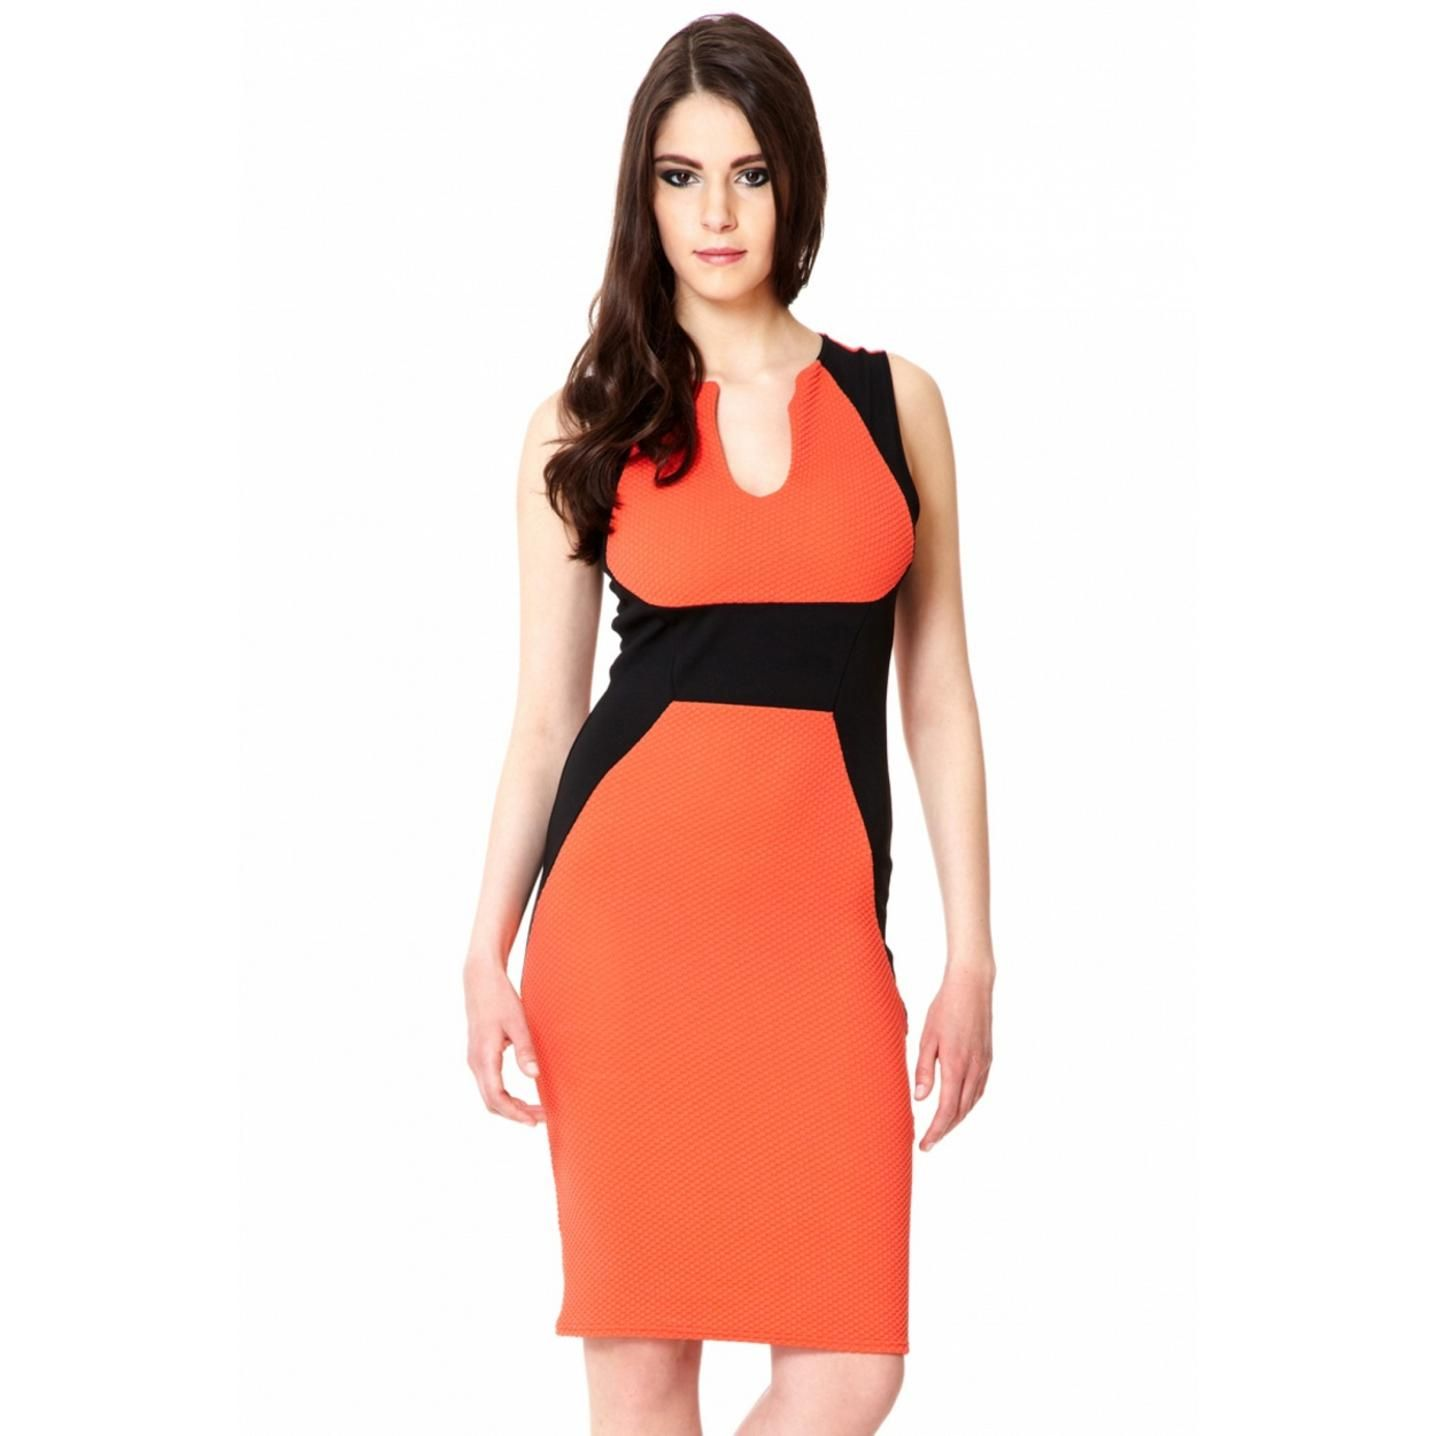 Marvelous Red Dress Hit The Floor Quiz